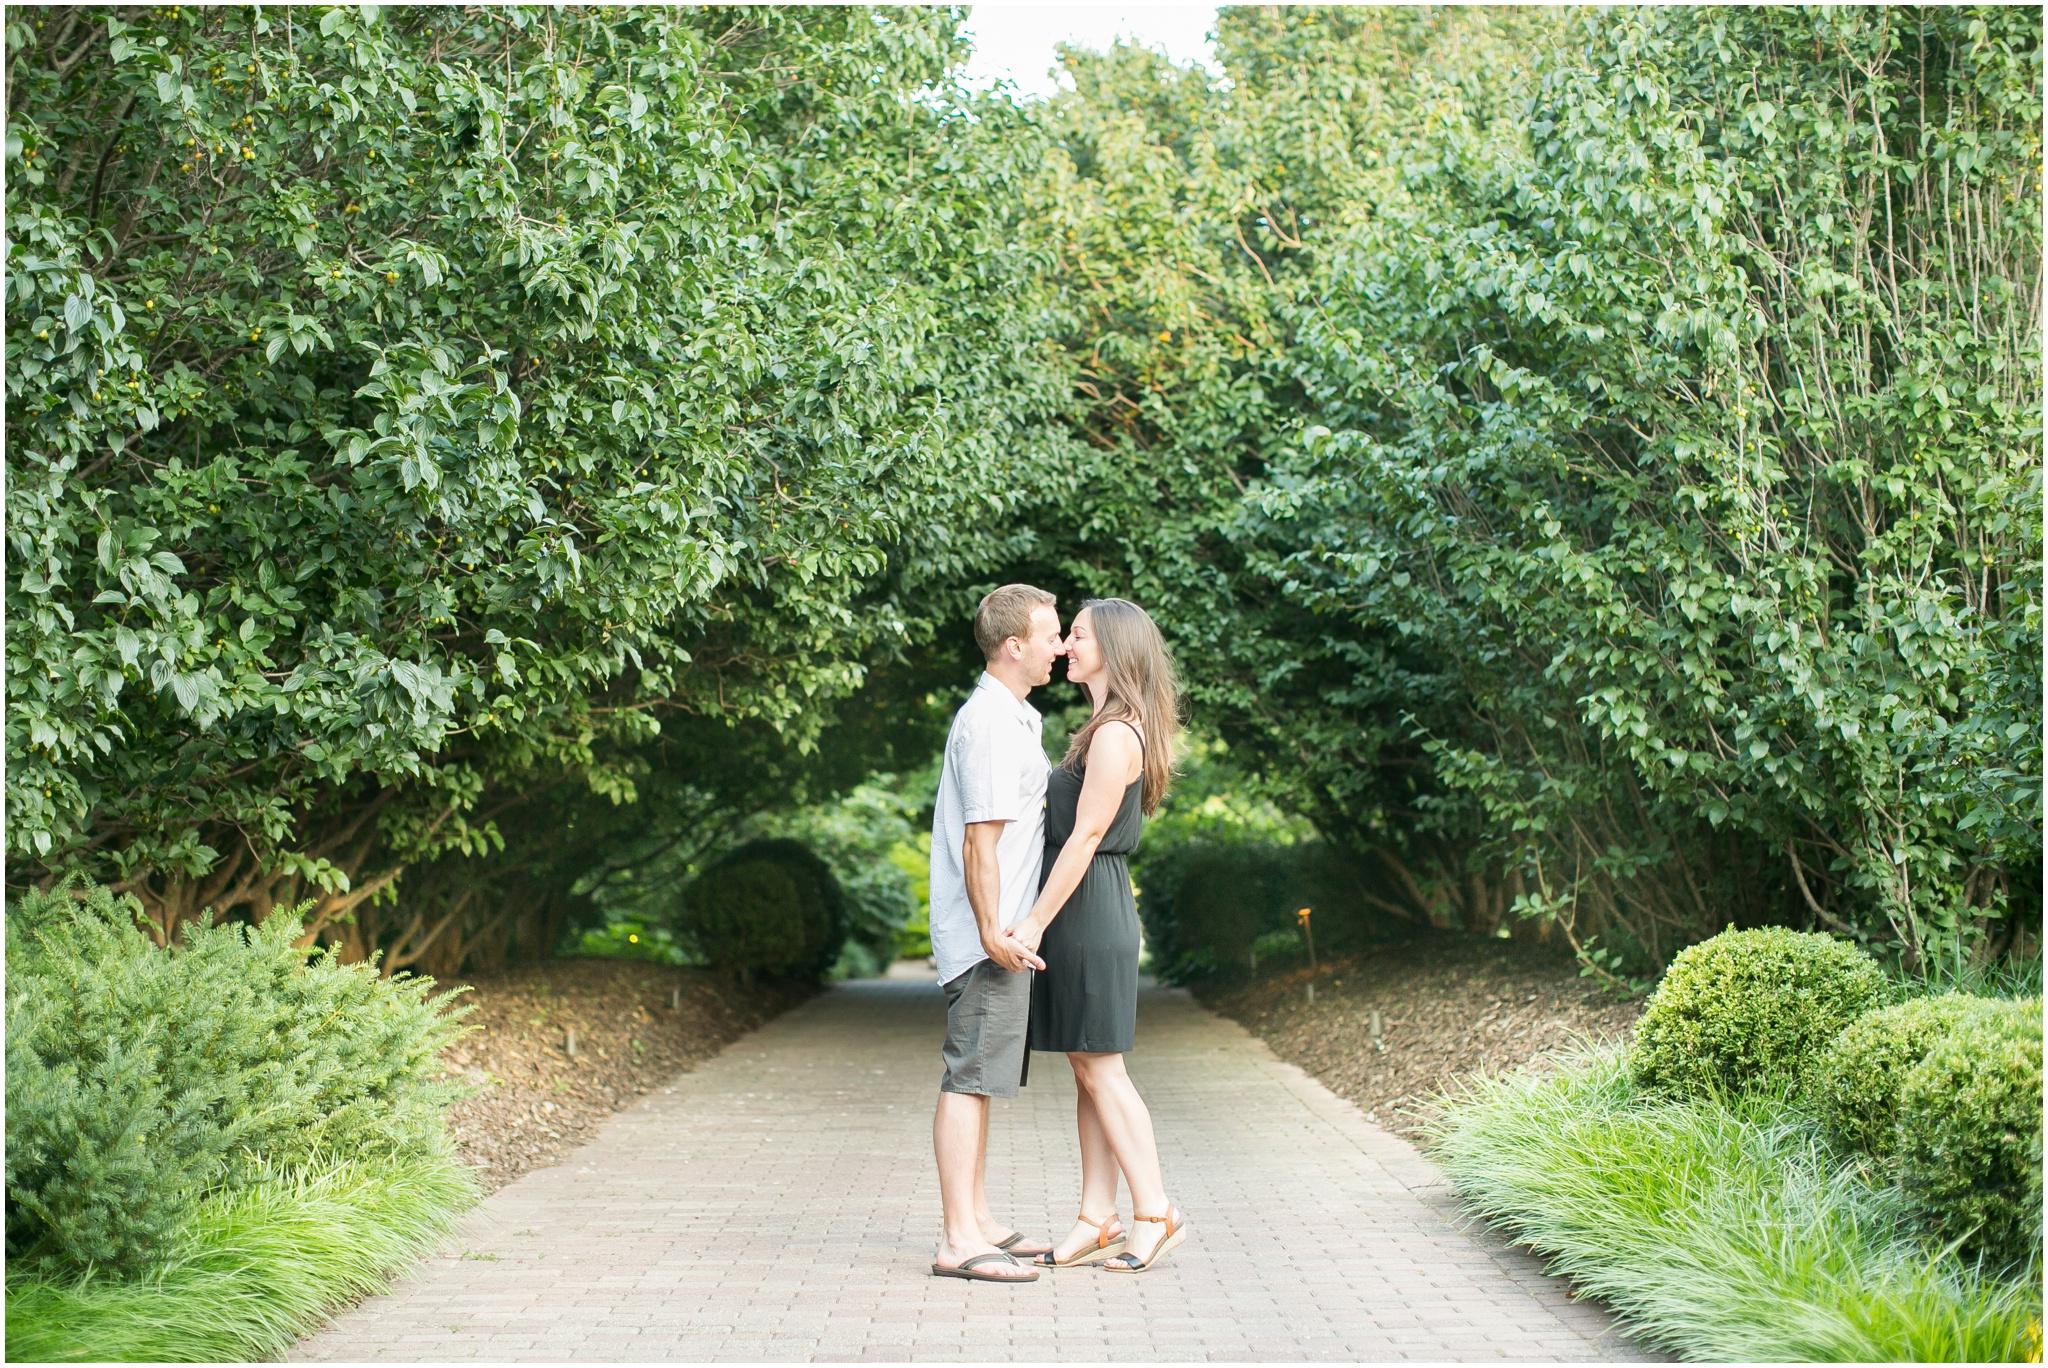 Olbrich_Botanical_Gardens_Madison_Wisconsin_Engagement_Session_0833.jpg